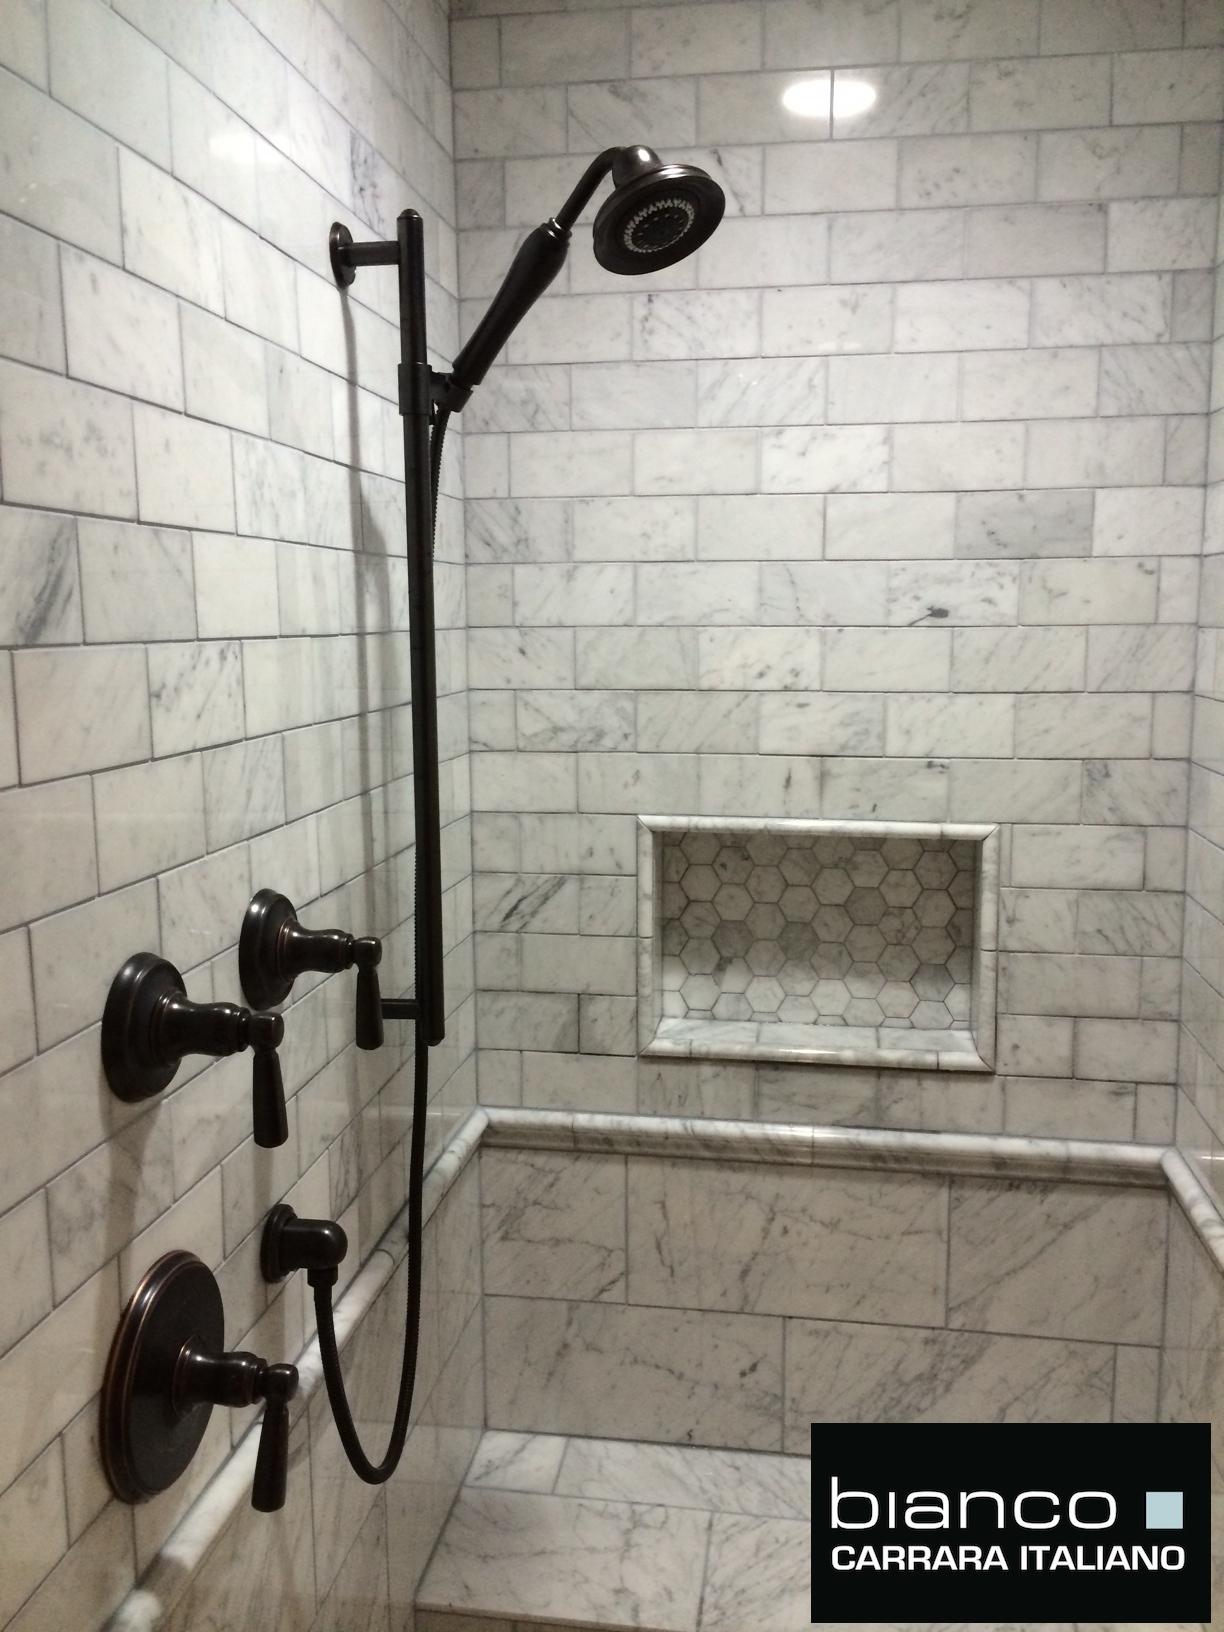 Carrara Bianco Polished Marble Bathroom  the builder